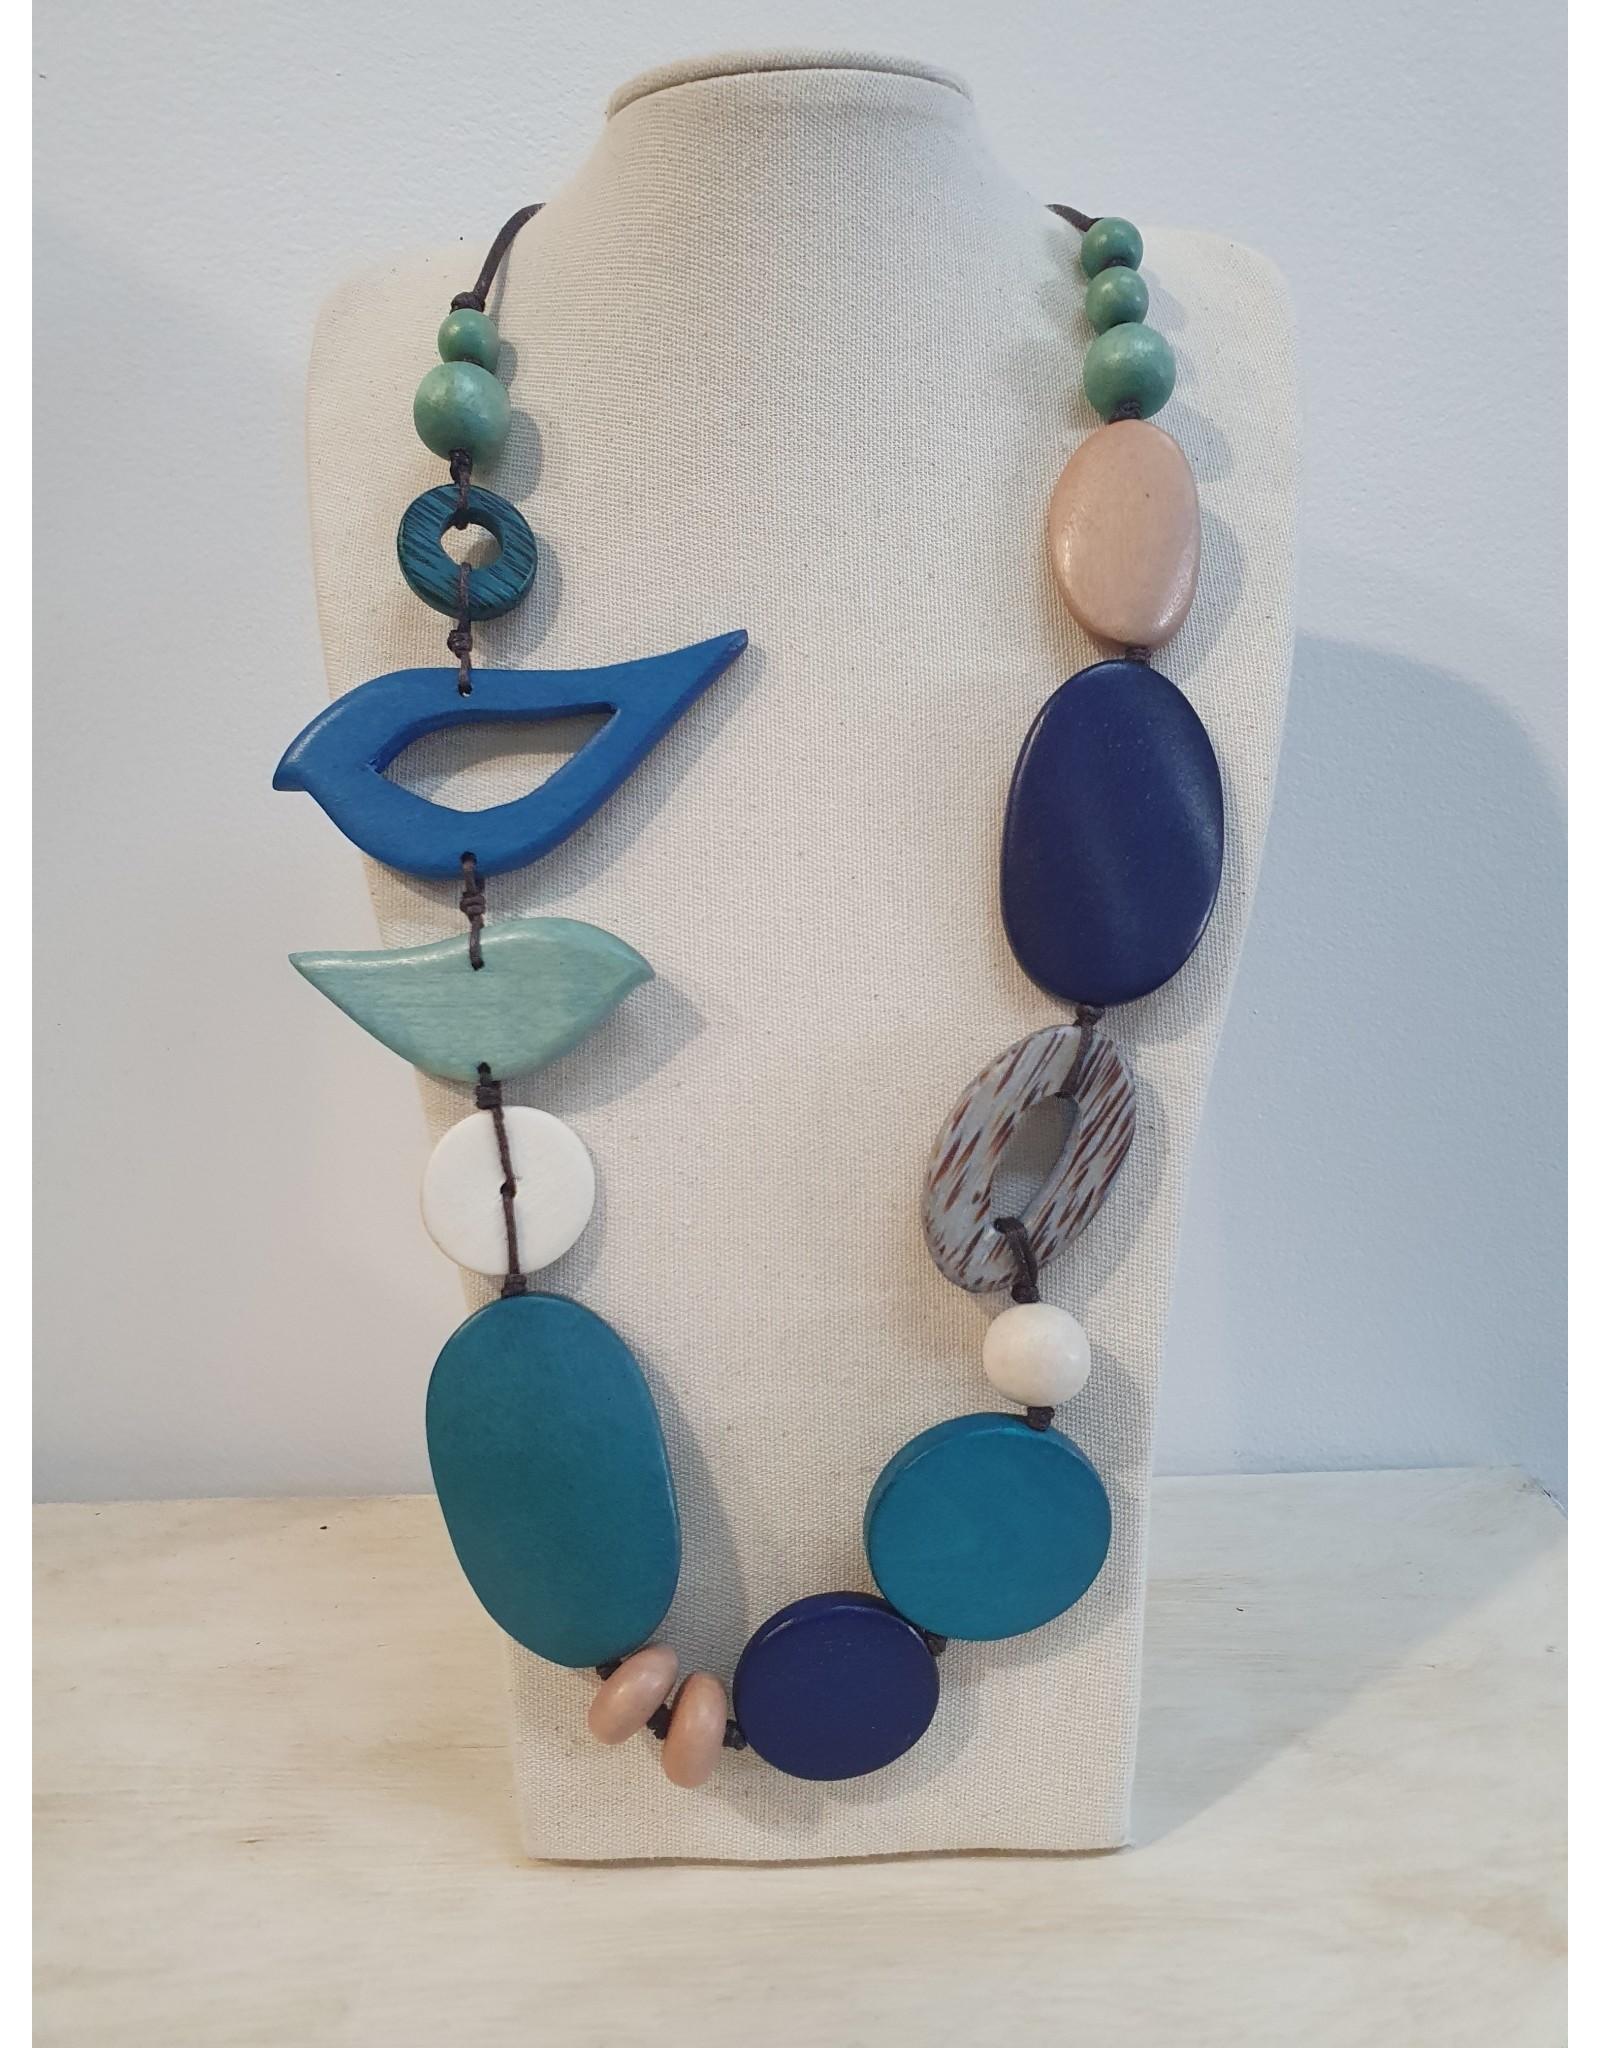 Cinnamon creations Wooden Blue Bird Necklace